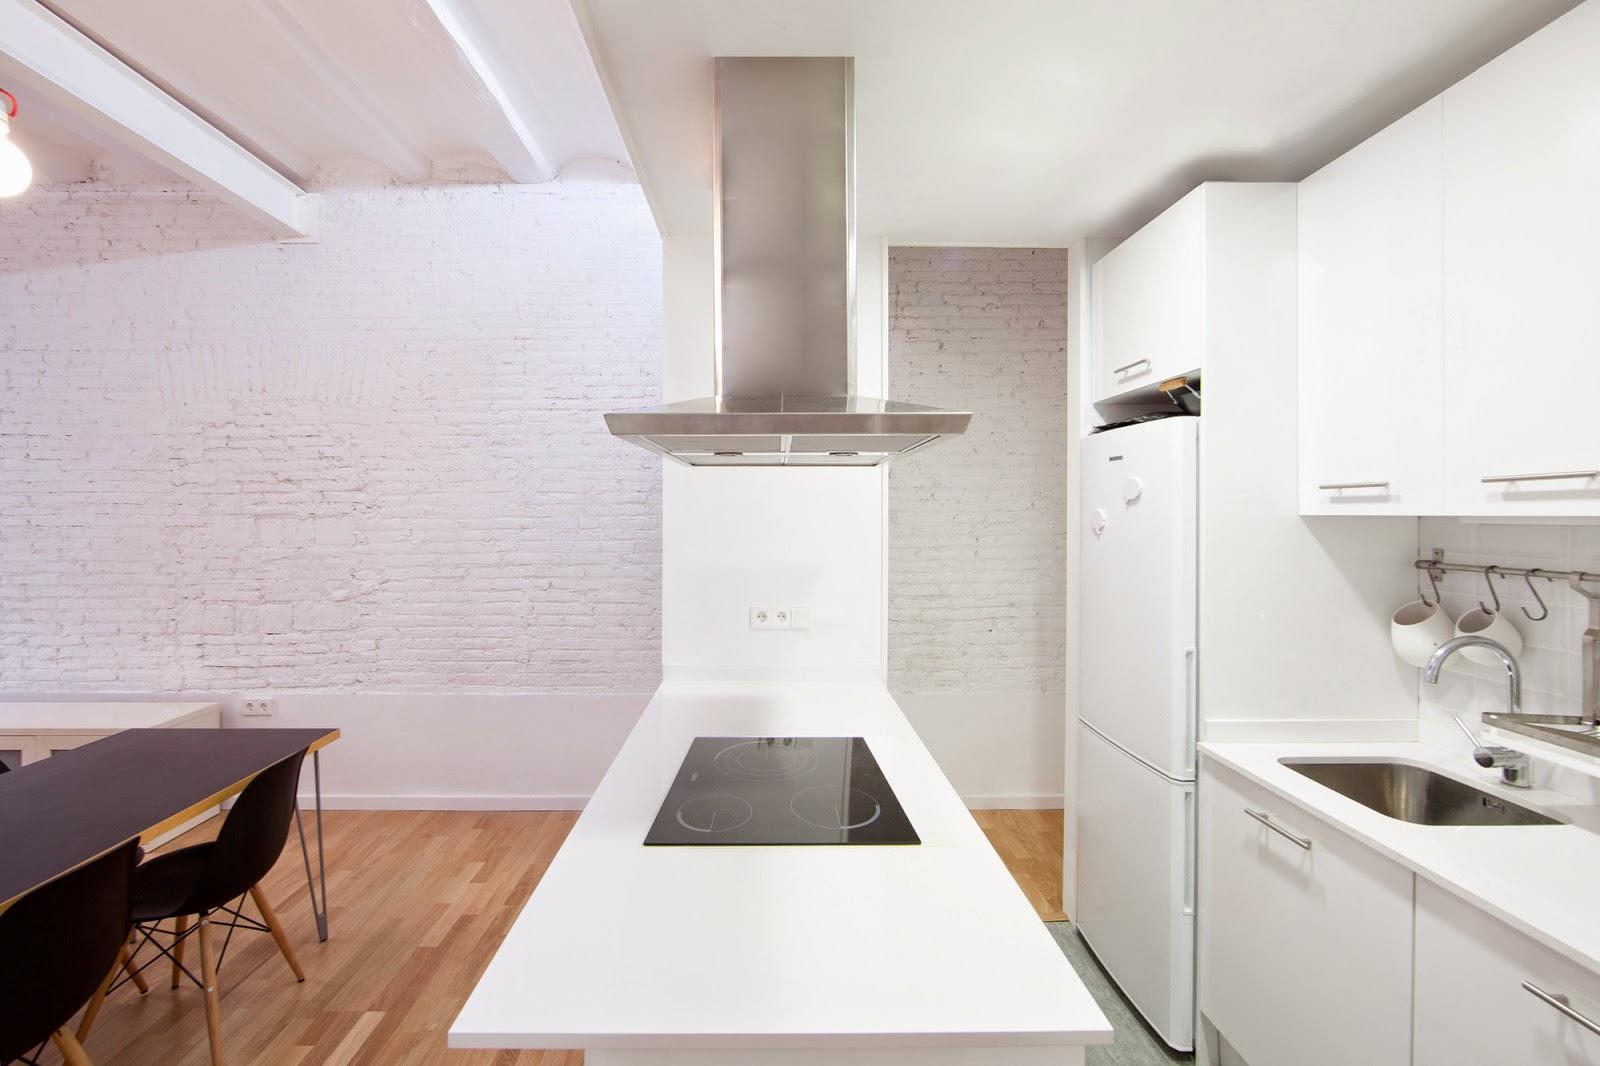 Однокомнатная квартира 40 кв м белая